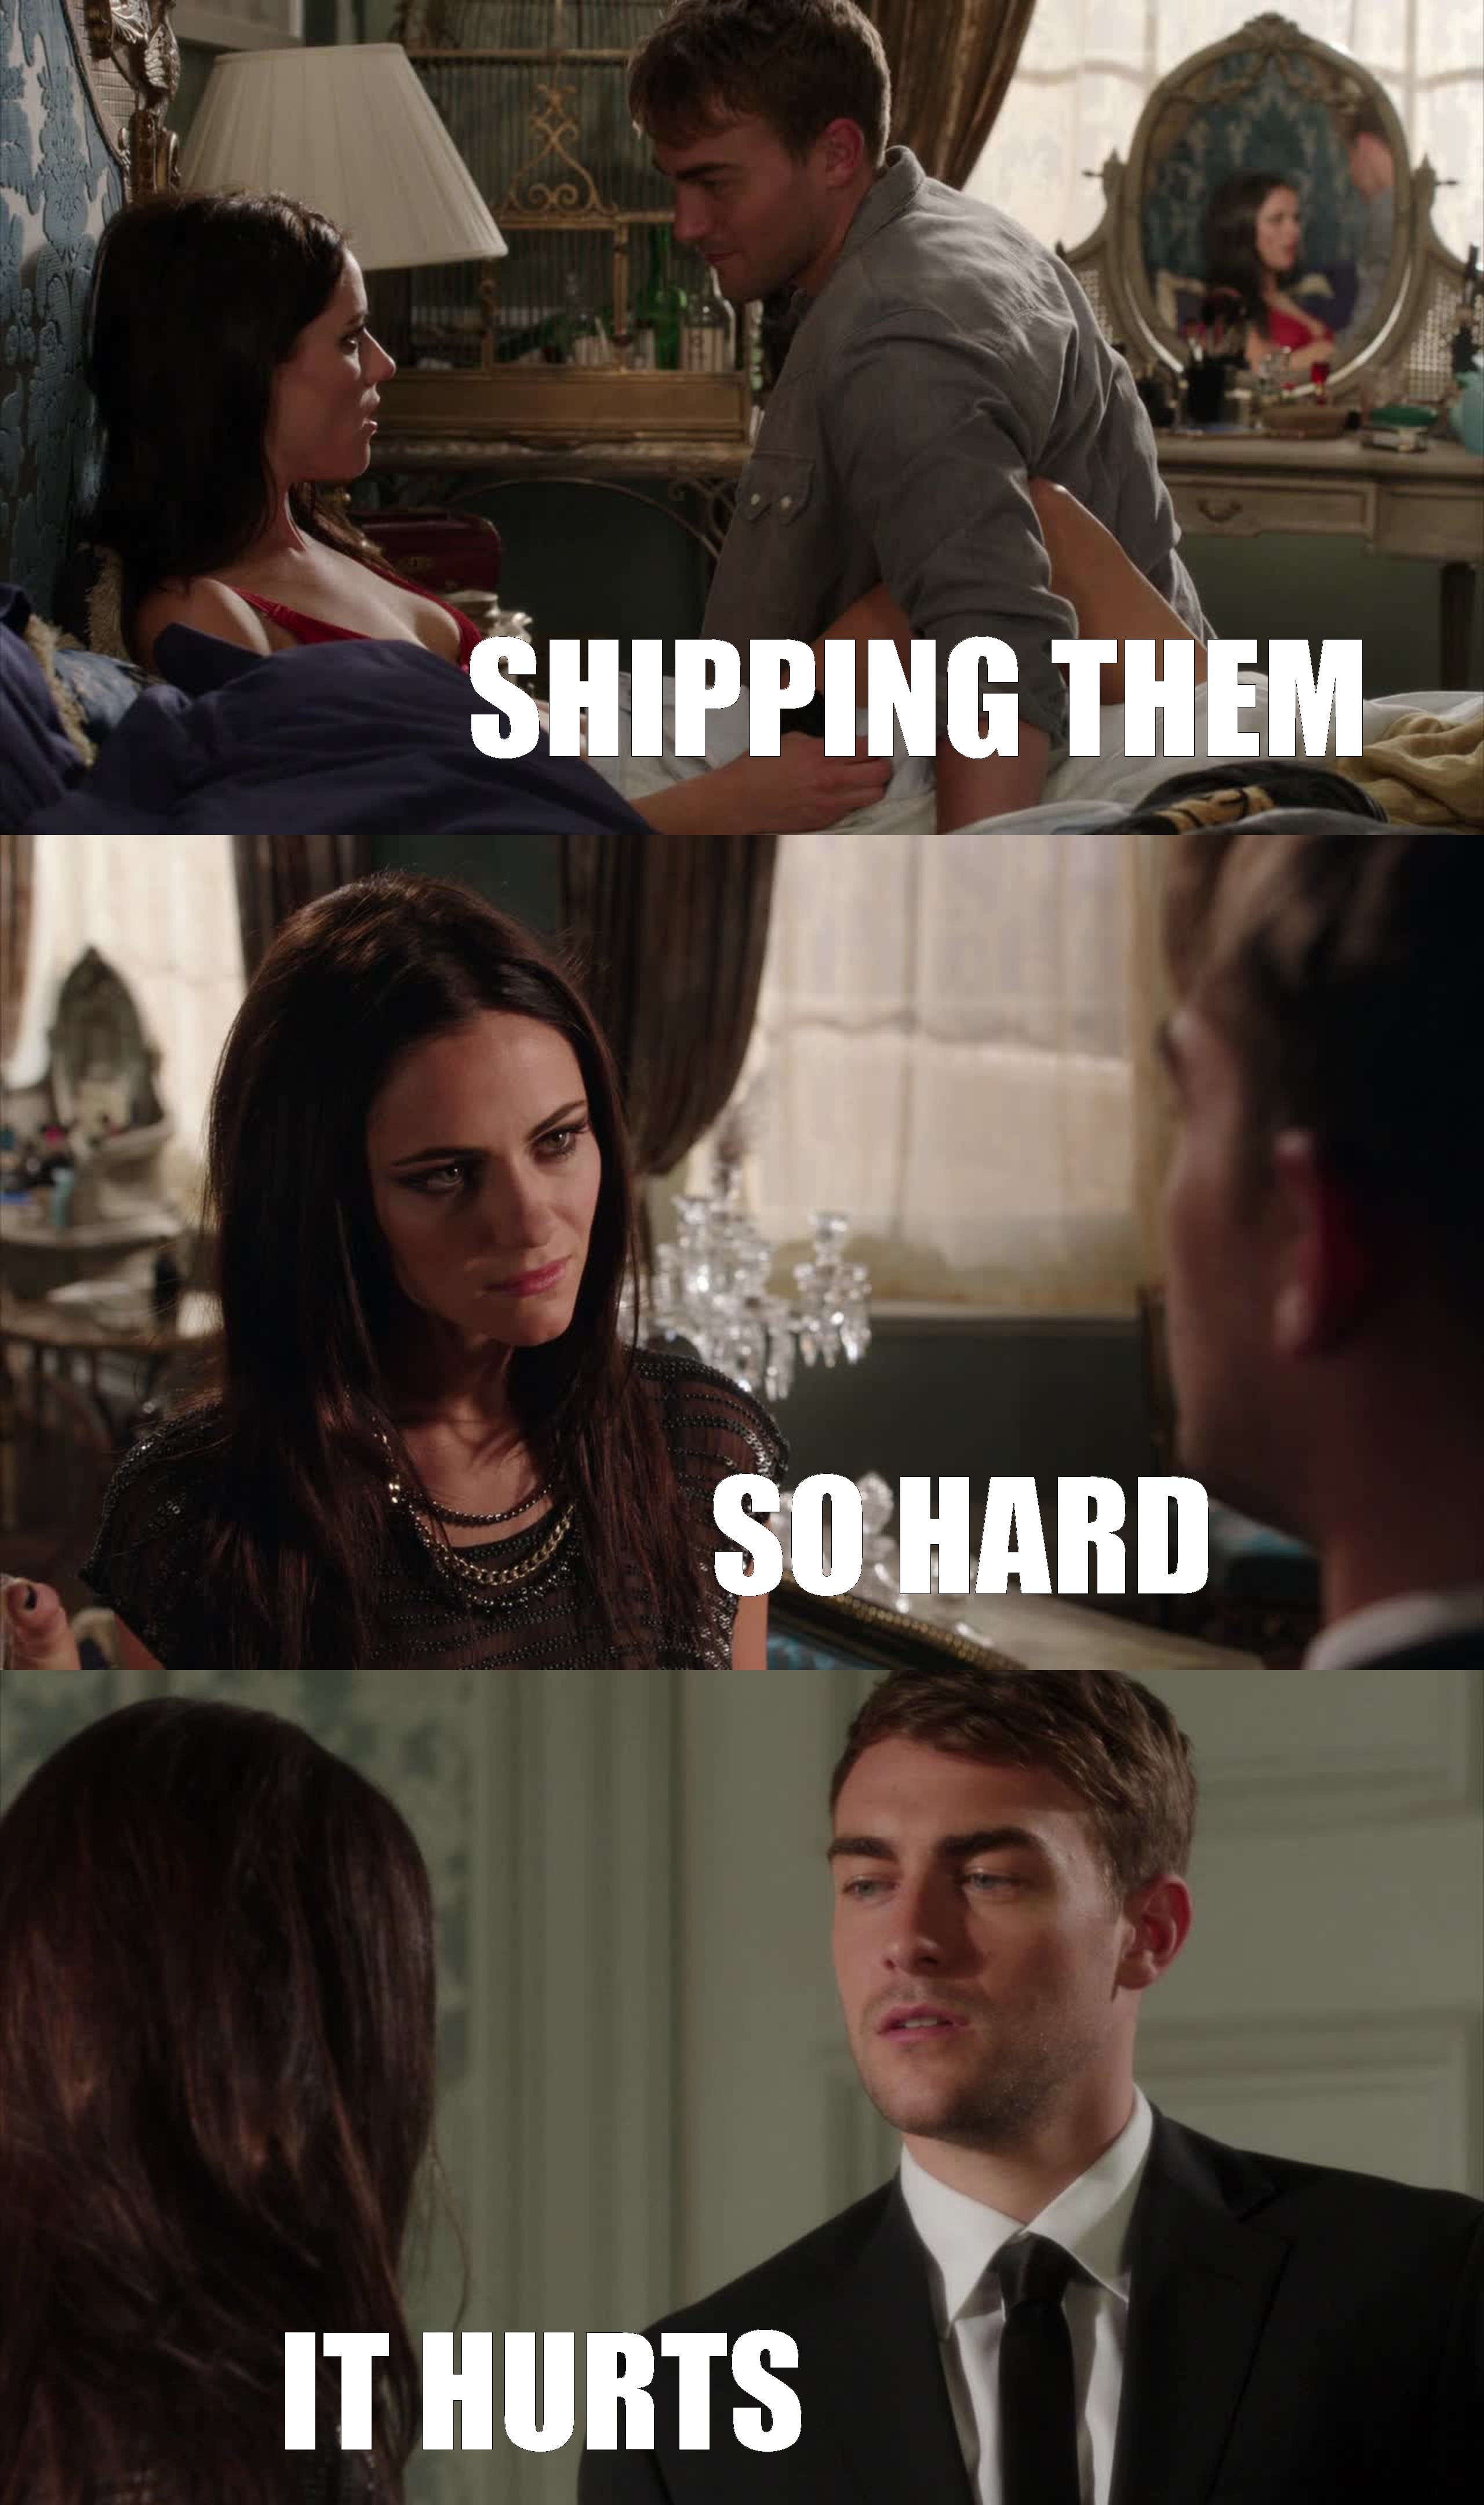 Gooooood ! Haven't felt that way since TVD season 1, Damon and Elena   I LOVE that show btw